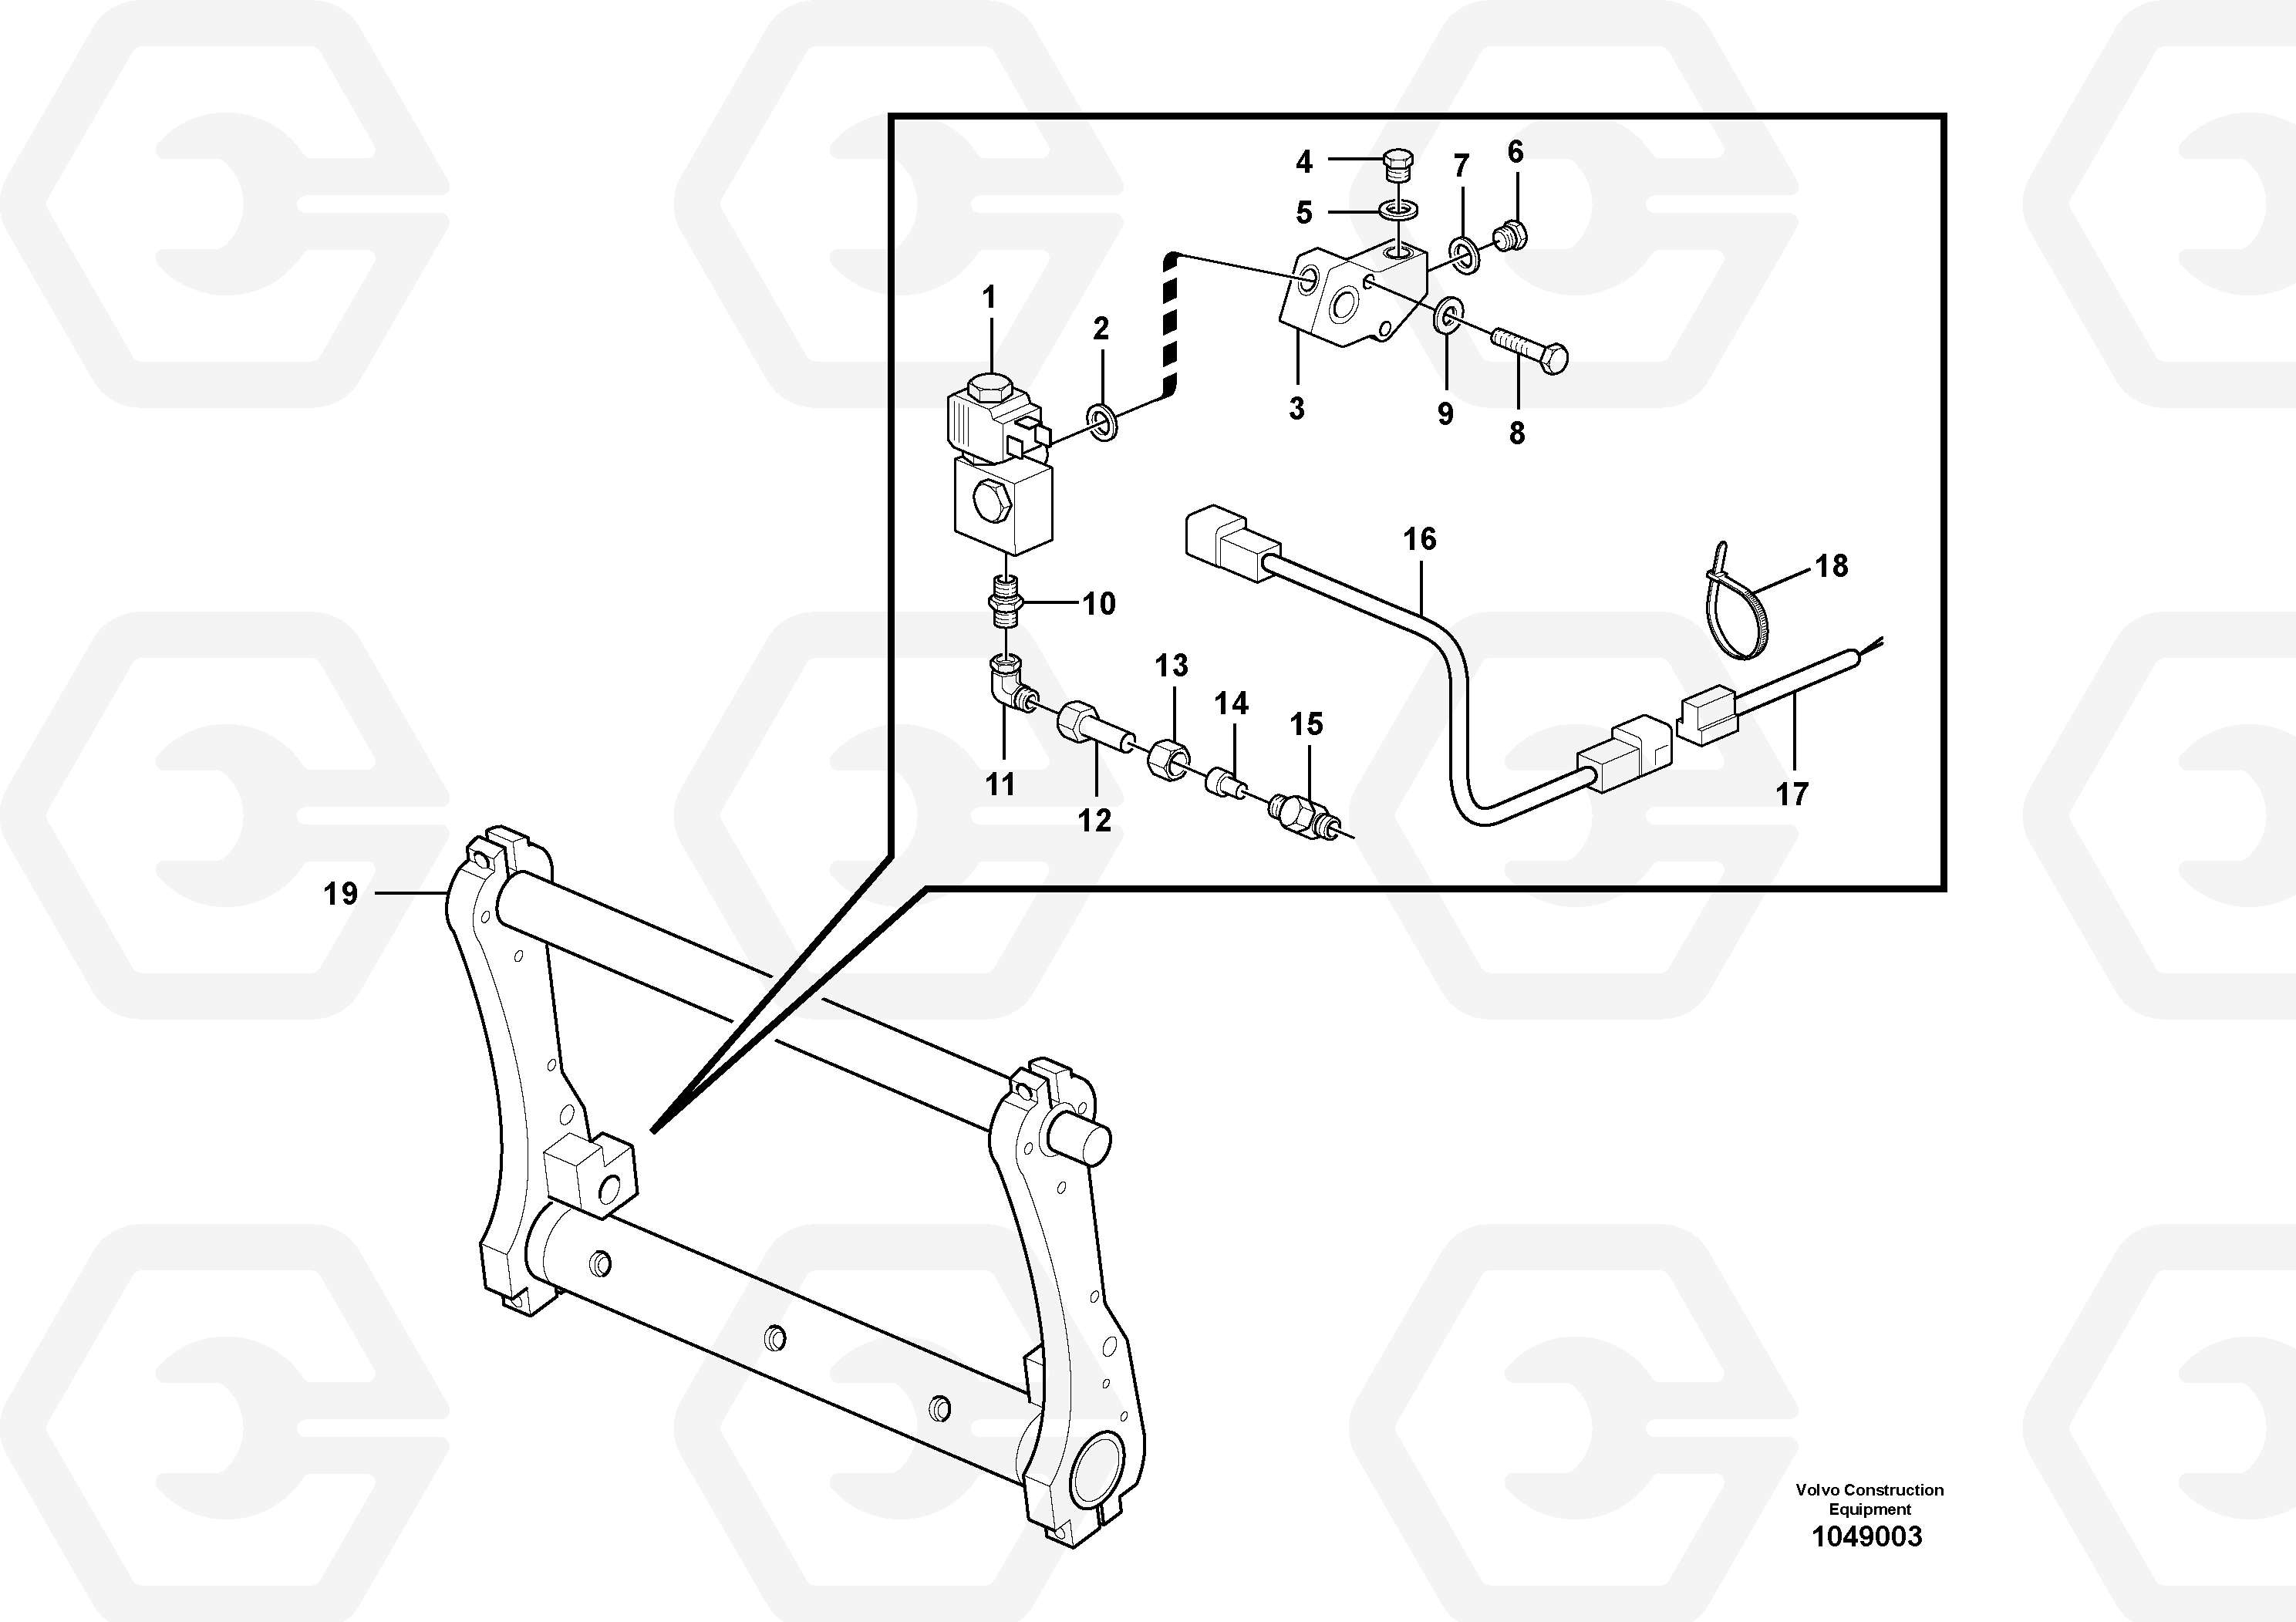 WRG-7489] Volvo L30b Wiring Diagram on volvo l45, volvo l120f, volvo l20b, volvo l60e,